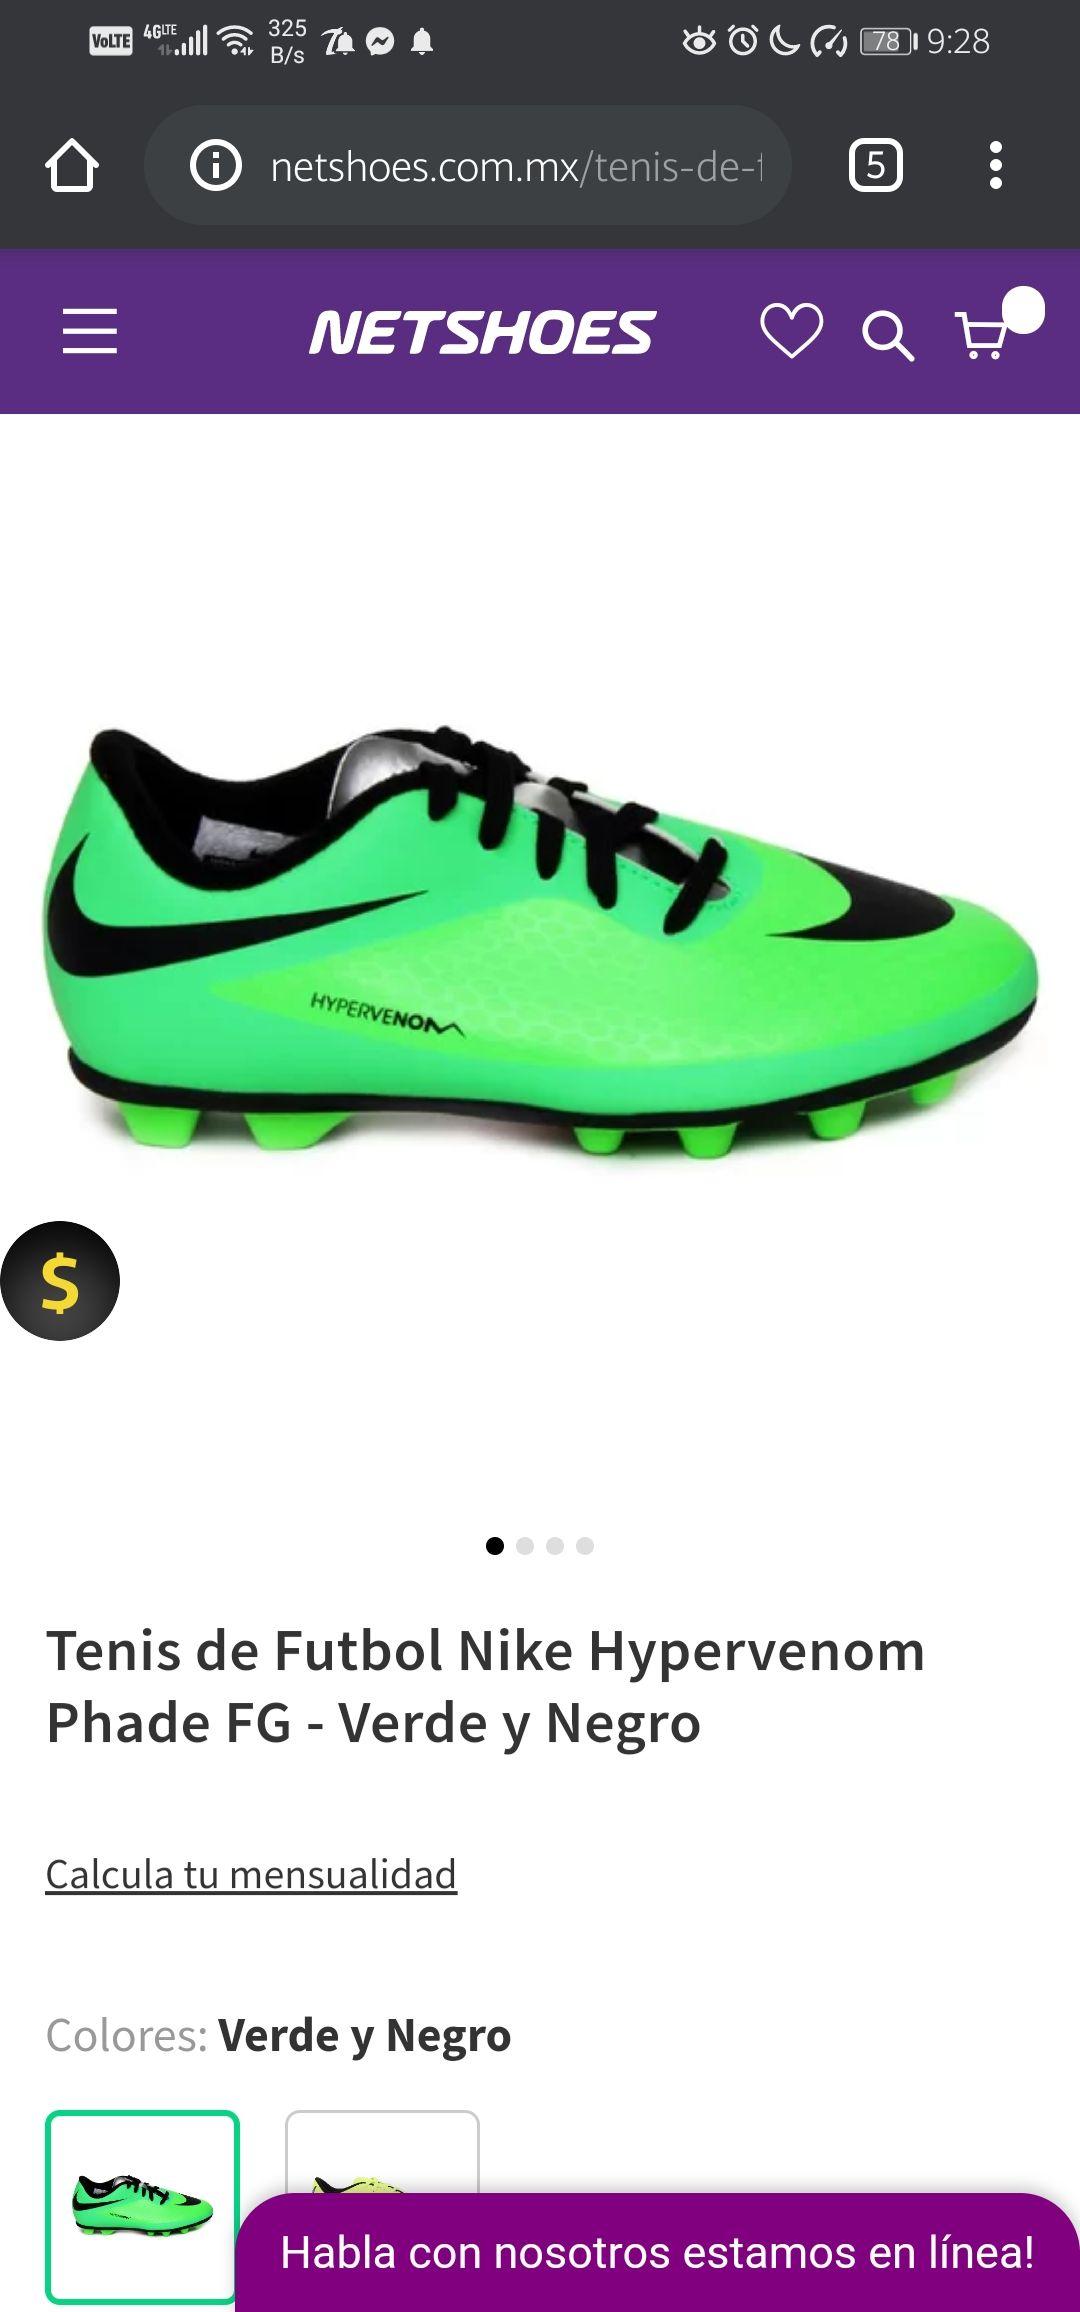 Netshoes: Nike Hypervenom Fade